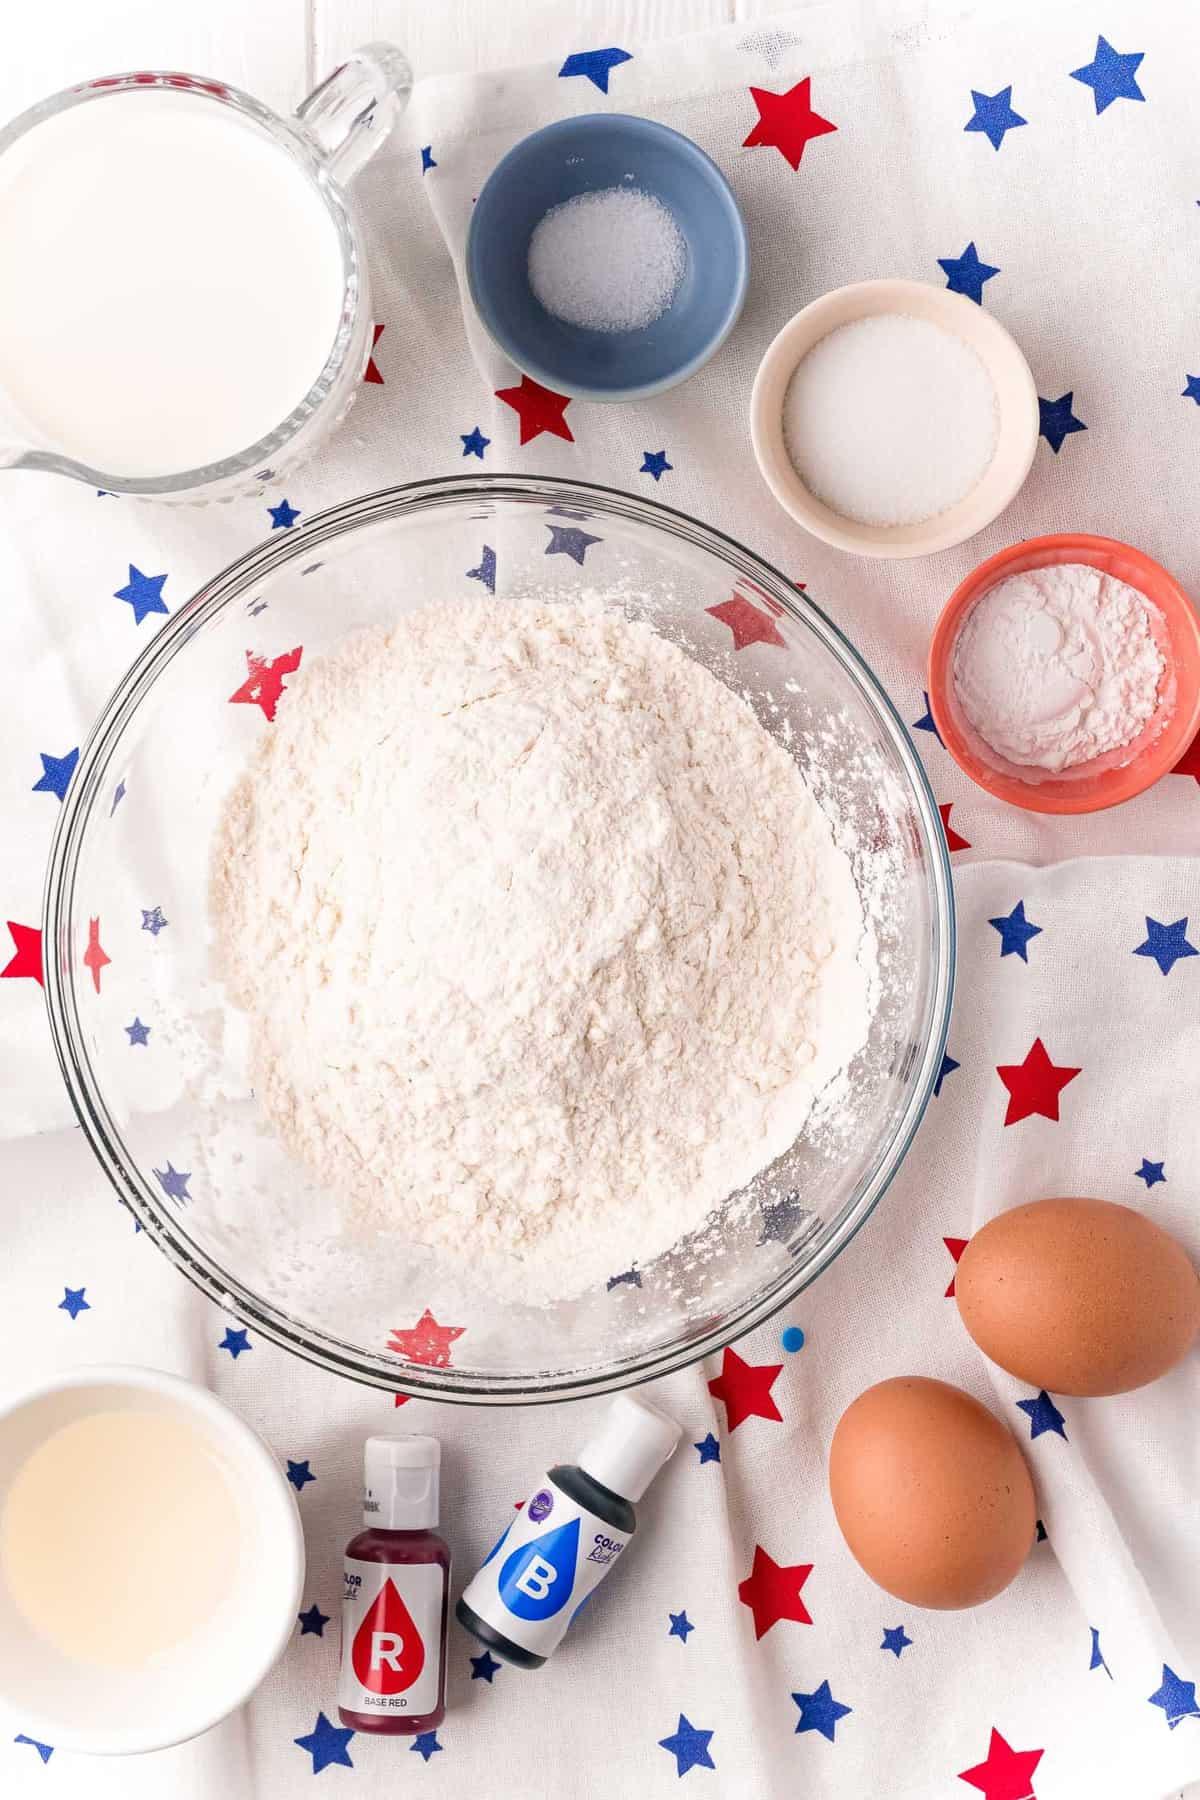 Overhead view of ingredients.